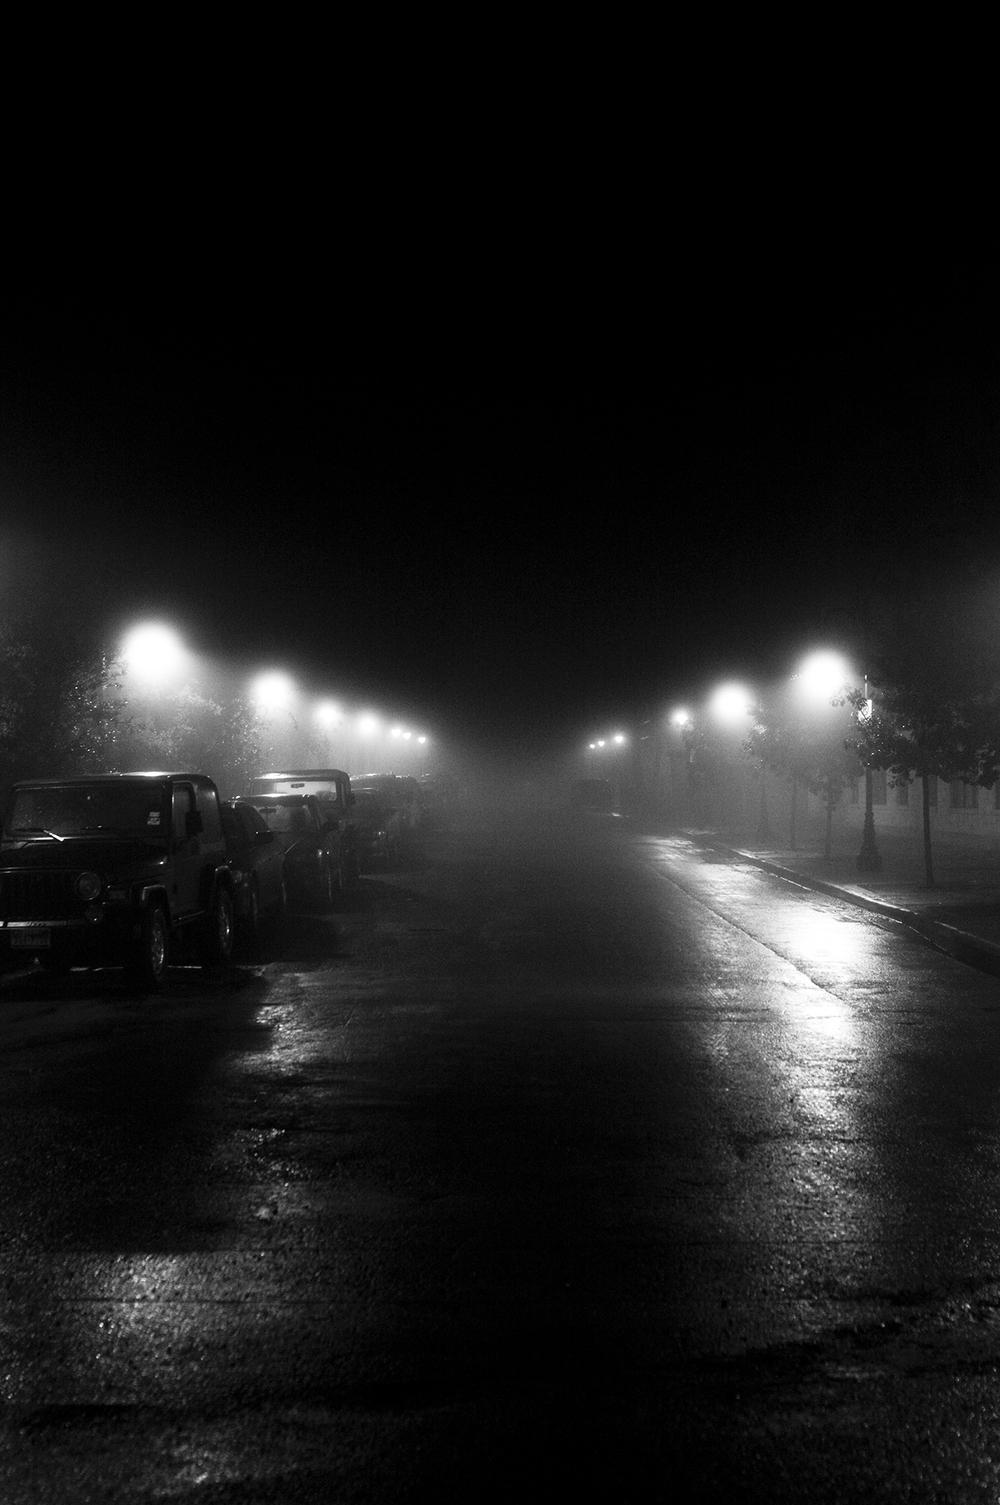 streets-fog.jpg